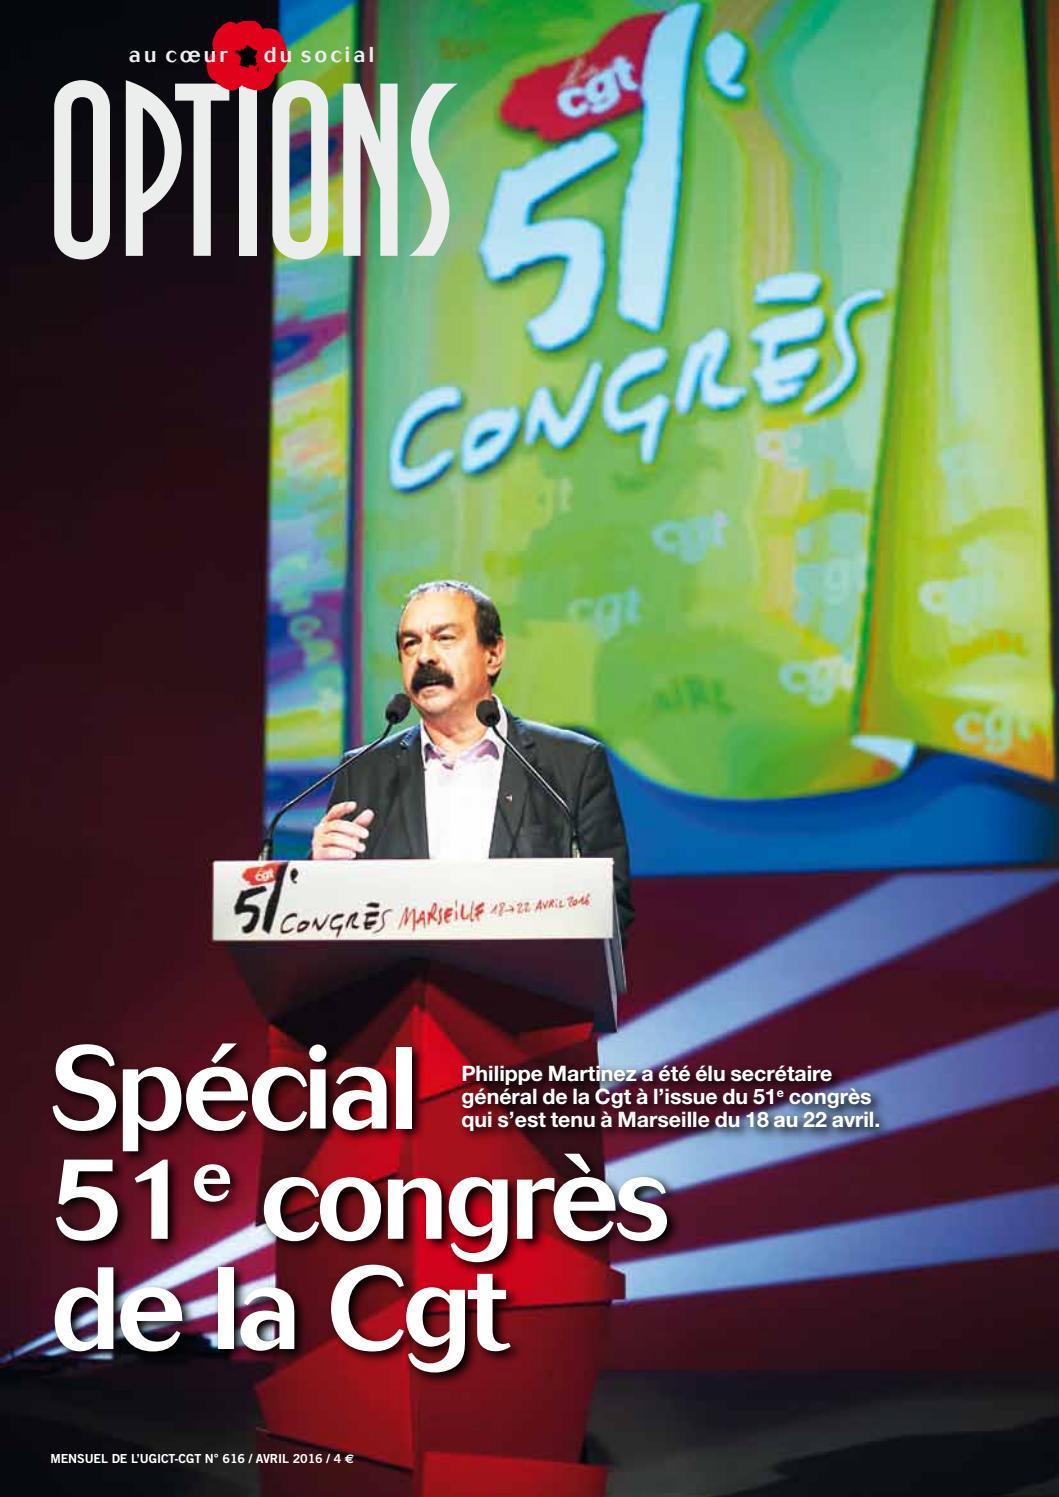 ed6f7a74ff2 Options 616 - Spécial 51e congrès de la CGT by UGICT CGT - issuu